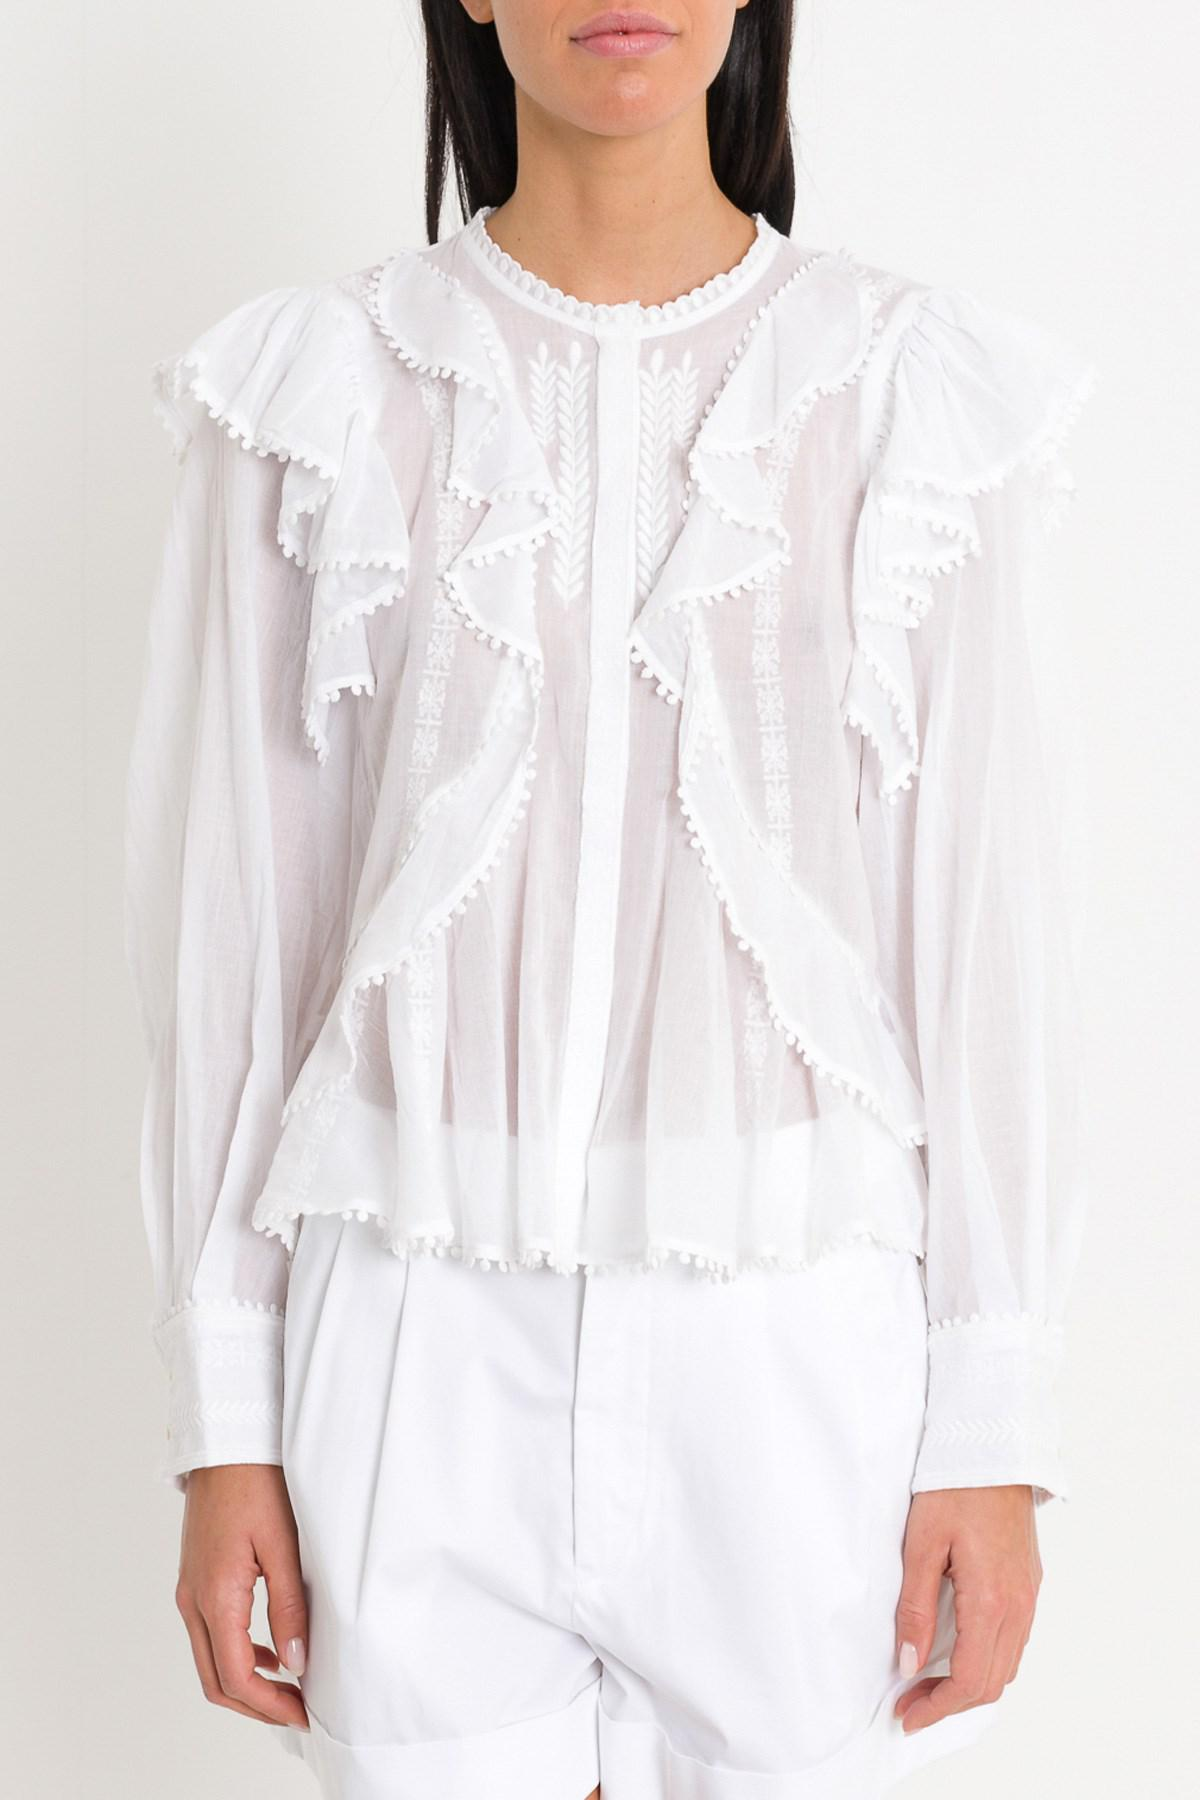 fb731b3e5de73 Lyst - Étoile Isabel Marant Alea Shirt With Furrles And Embroideries ...